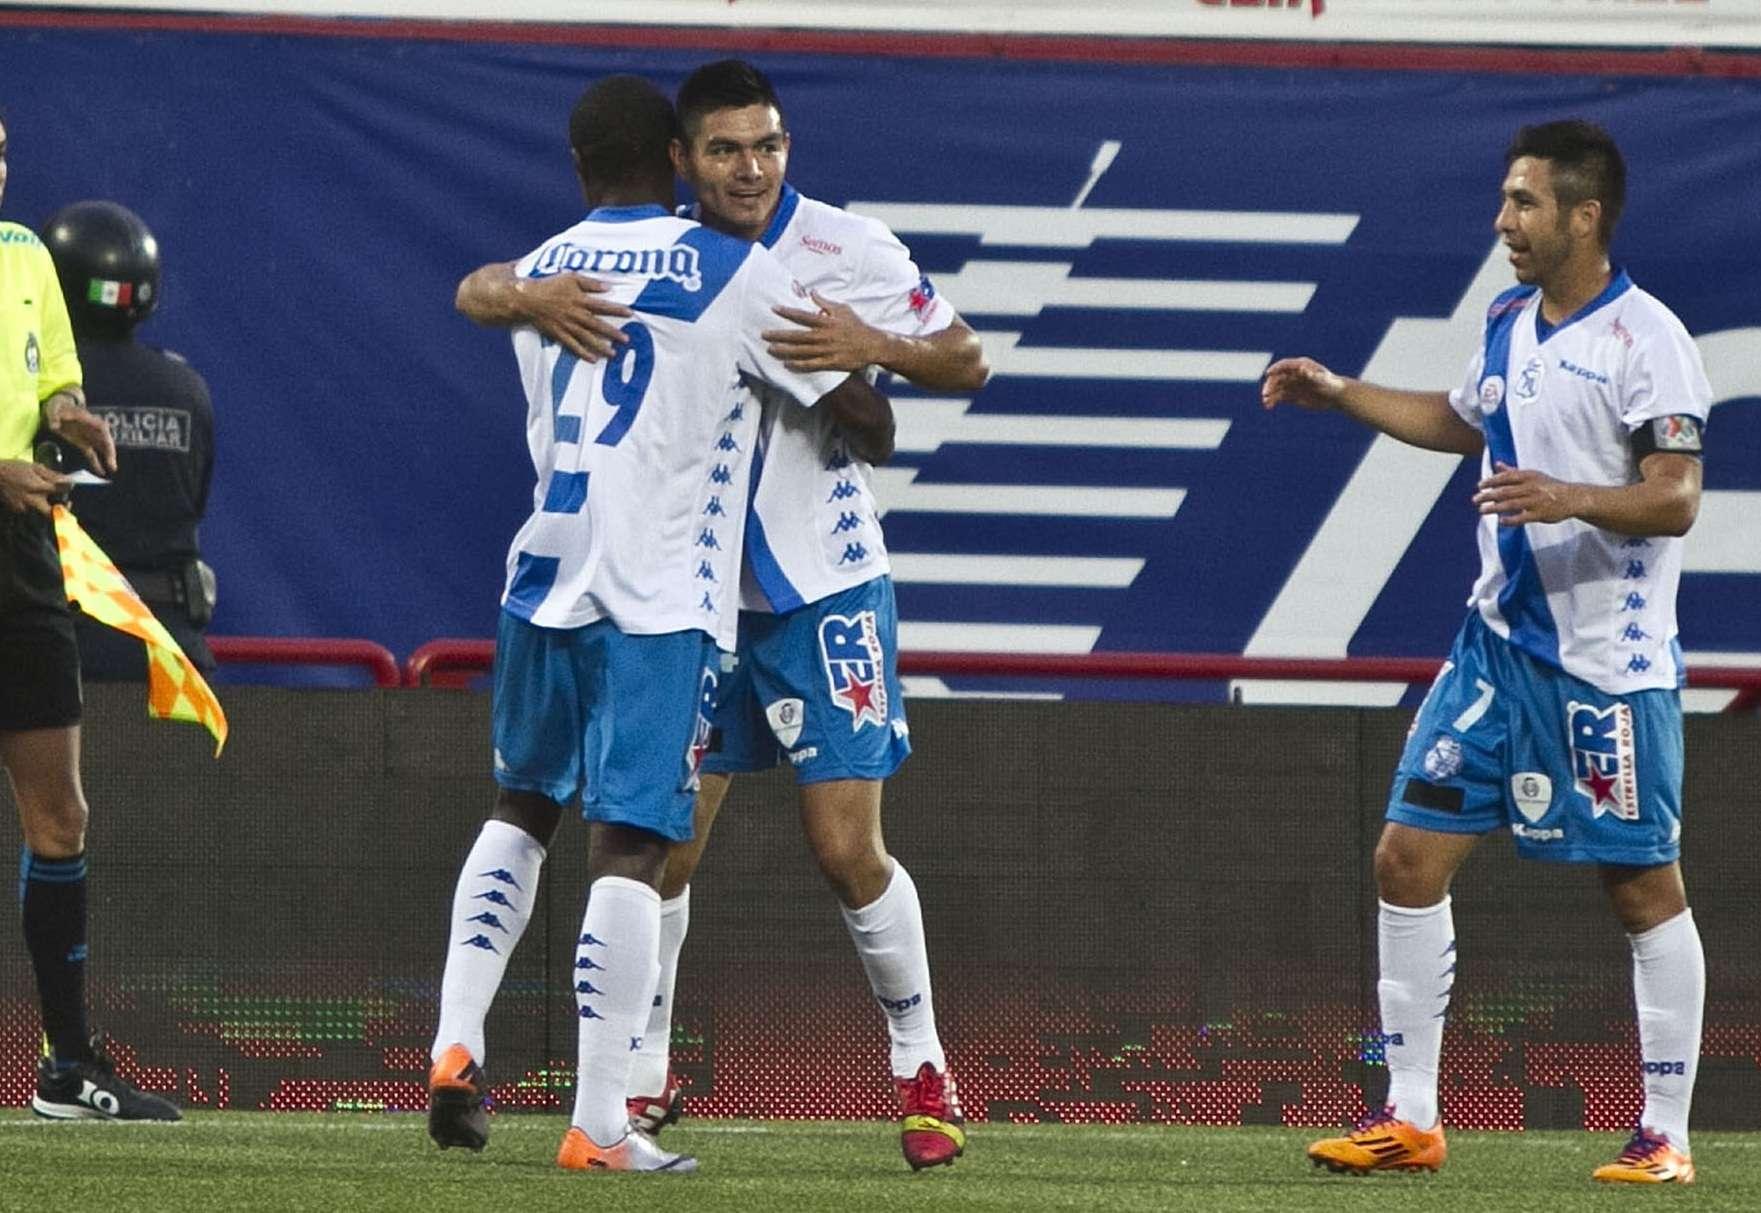 Luis Loroña marcó el gol del triunfo de Puebla 1-0 sobre Xolos de Tijuana. Foto: Mexsport